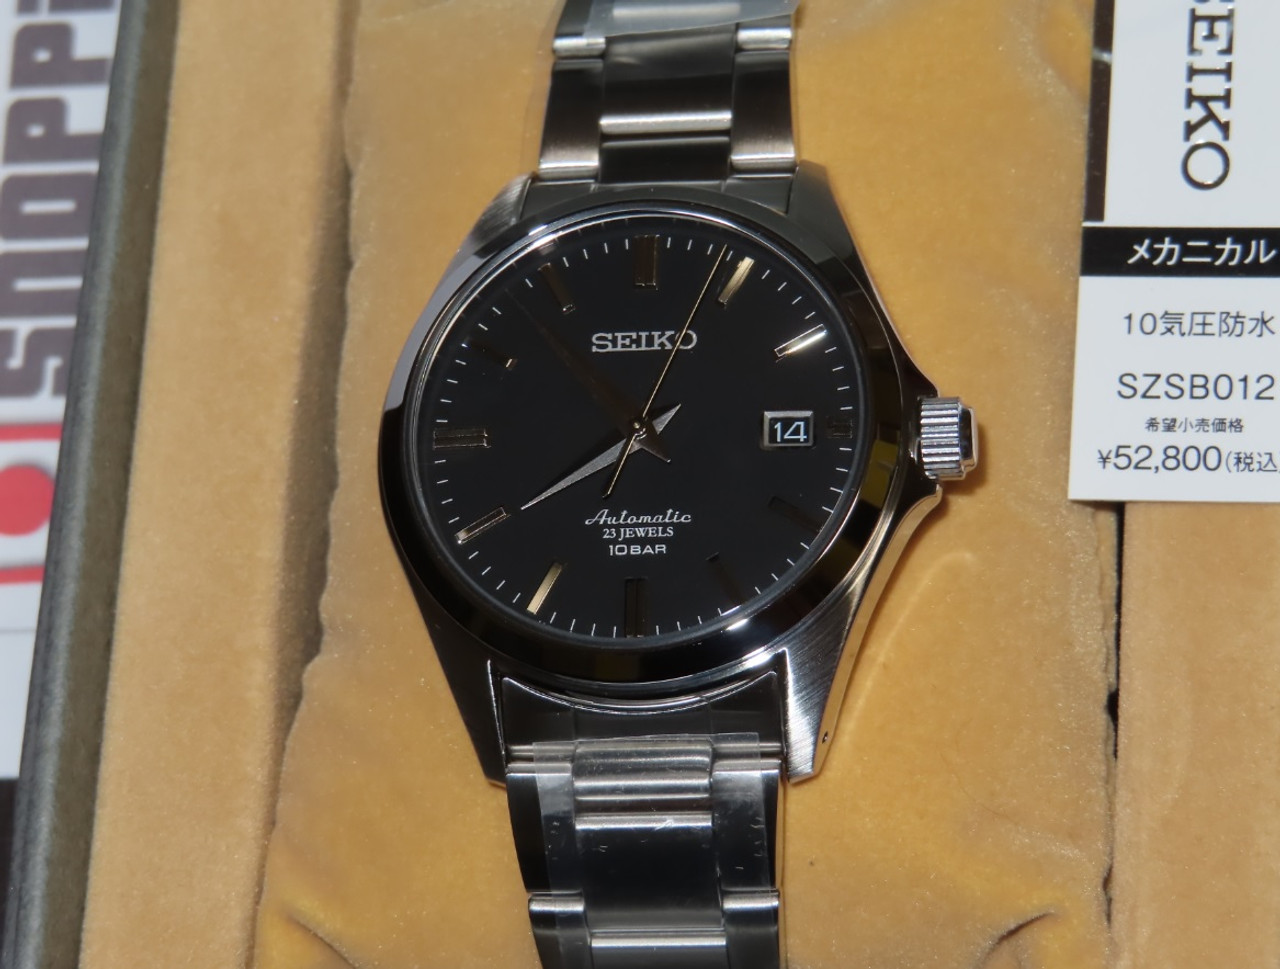 Seiko Classic JDM Special Edition SZSB012